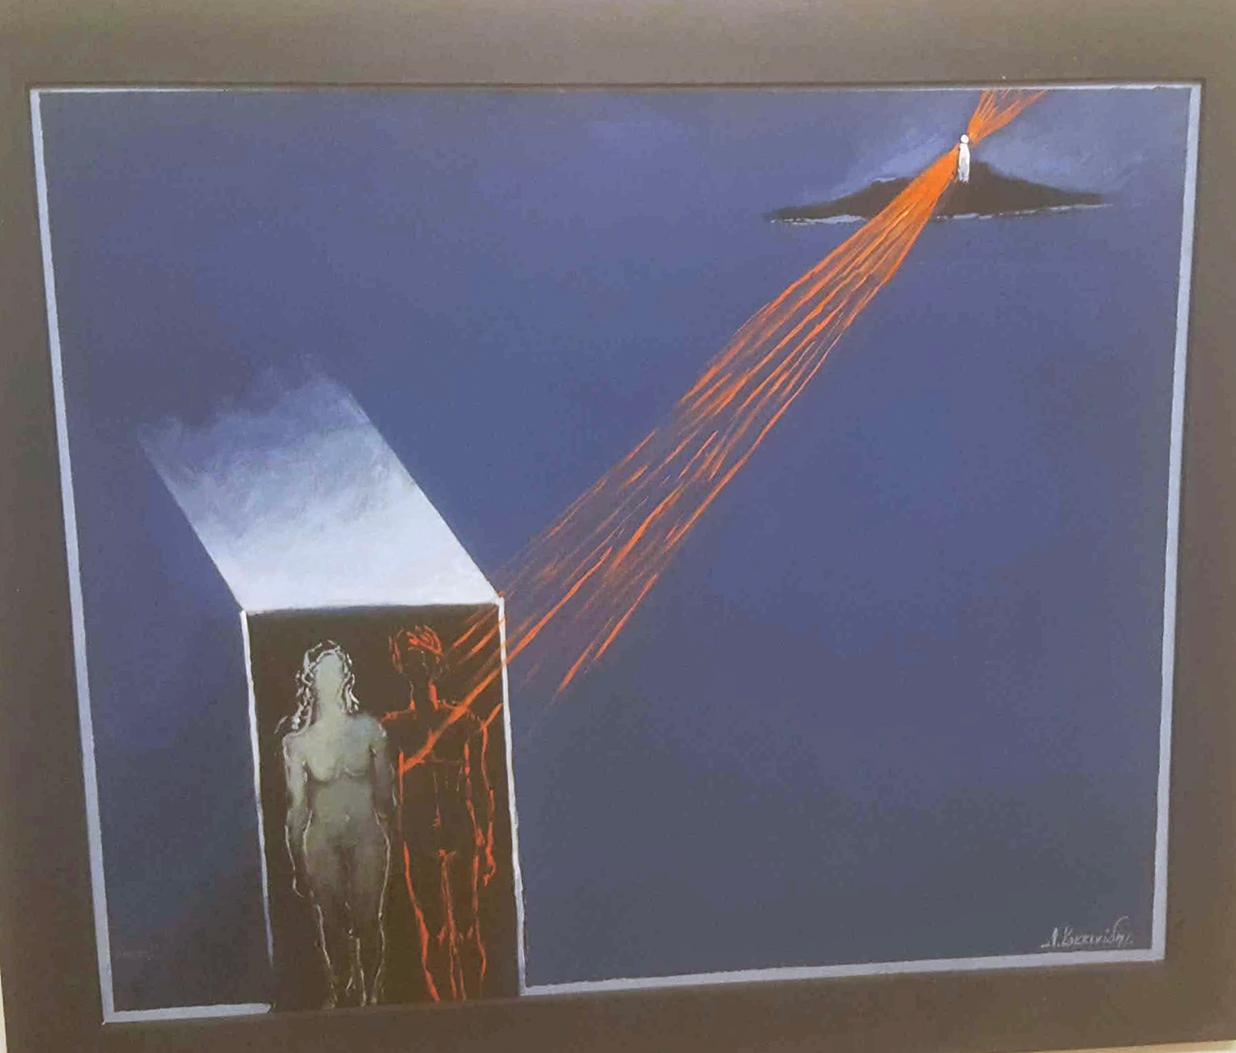 Dimosthenis Kokkinidis, Untitled, acrylics on canvas, 60 x 70 cm